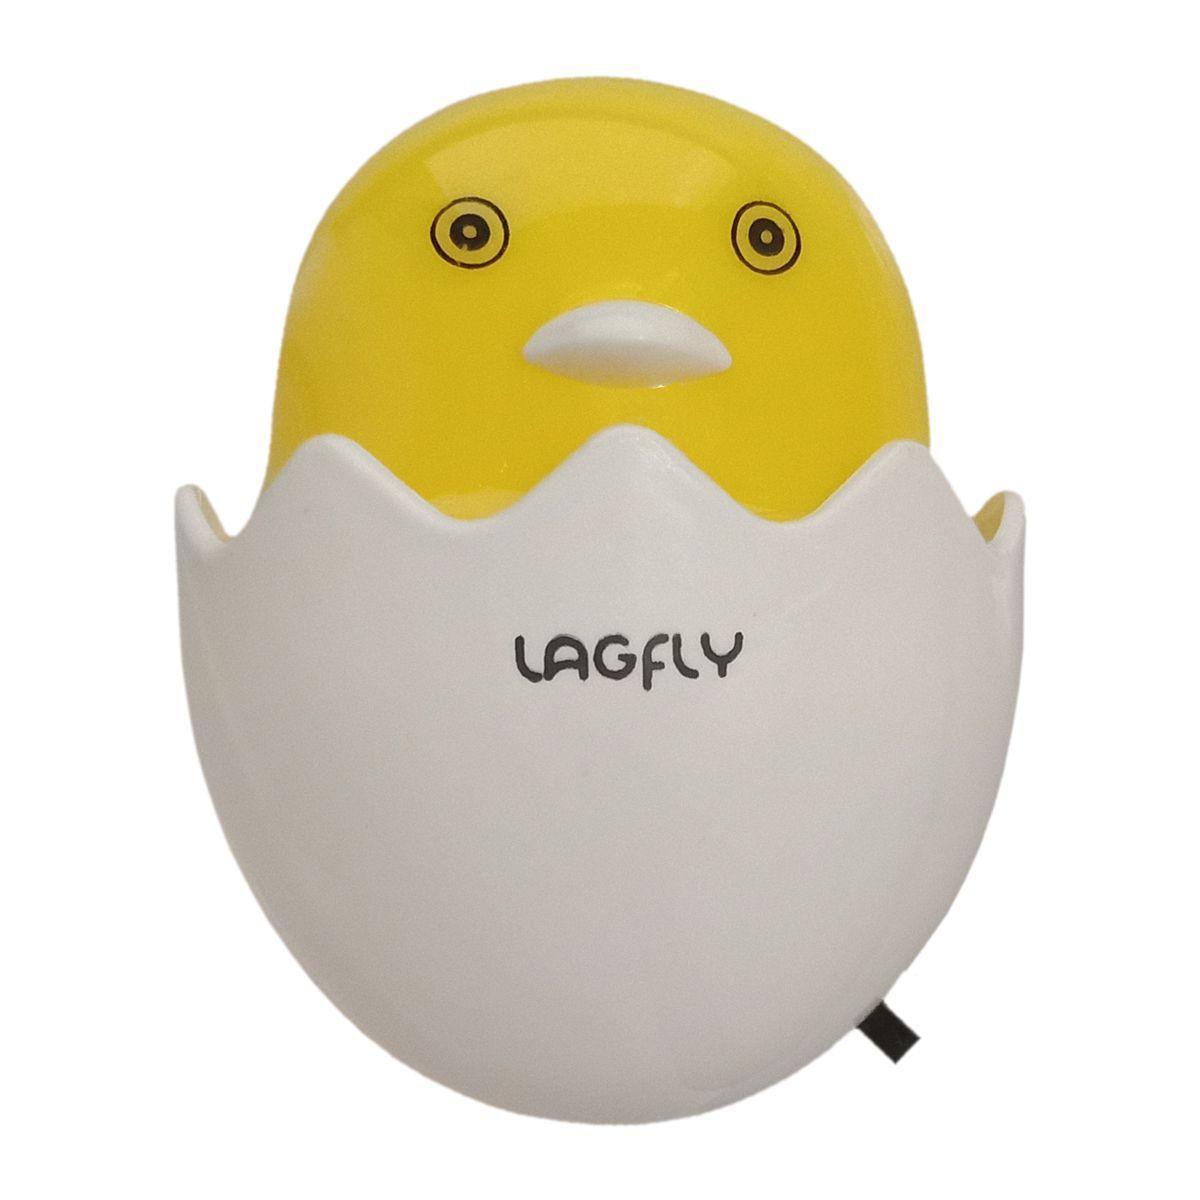 lagfly Night Lamp White - Pack of 1